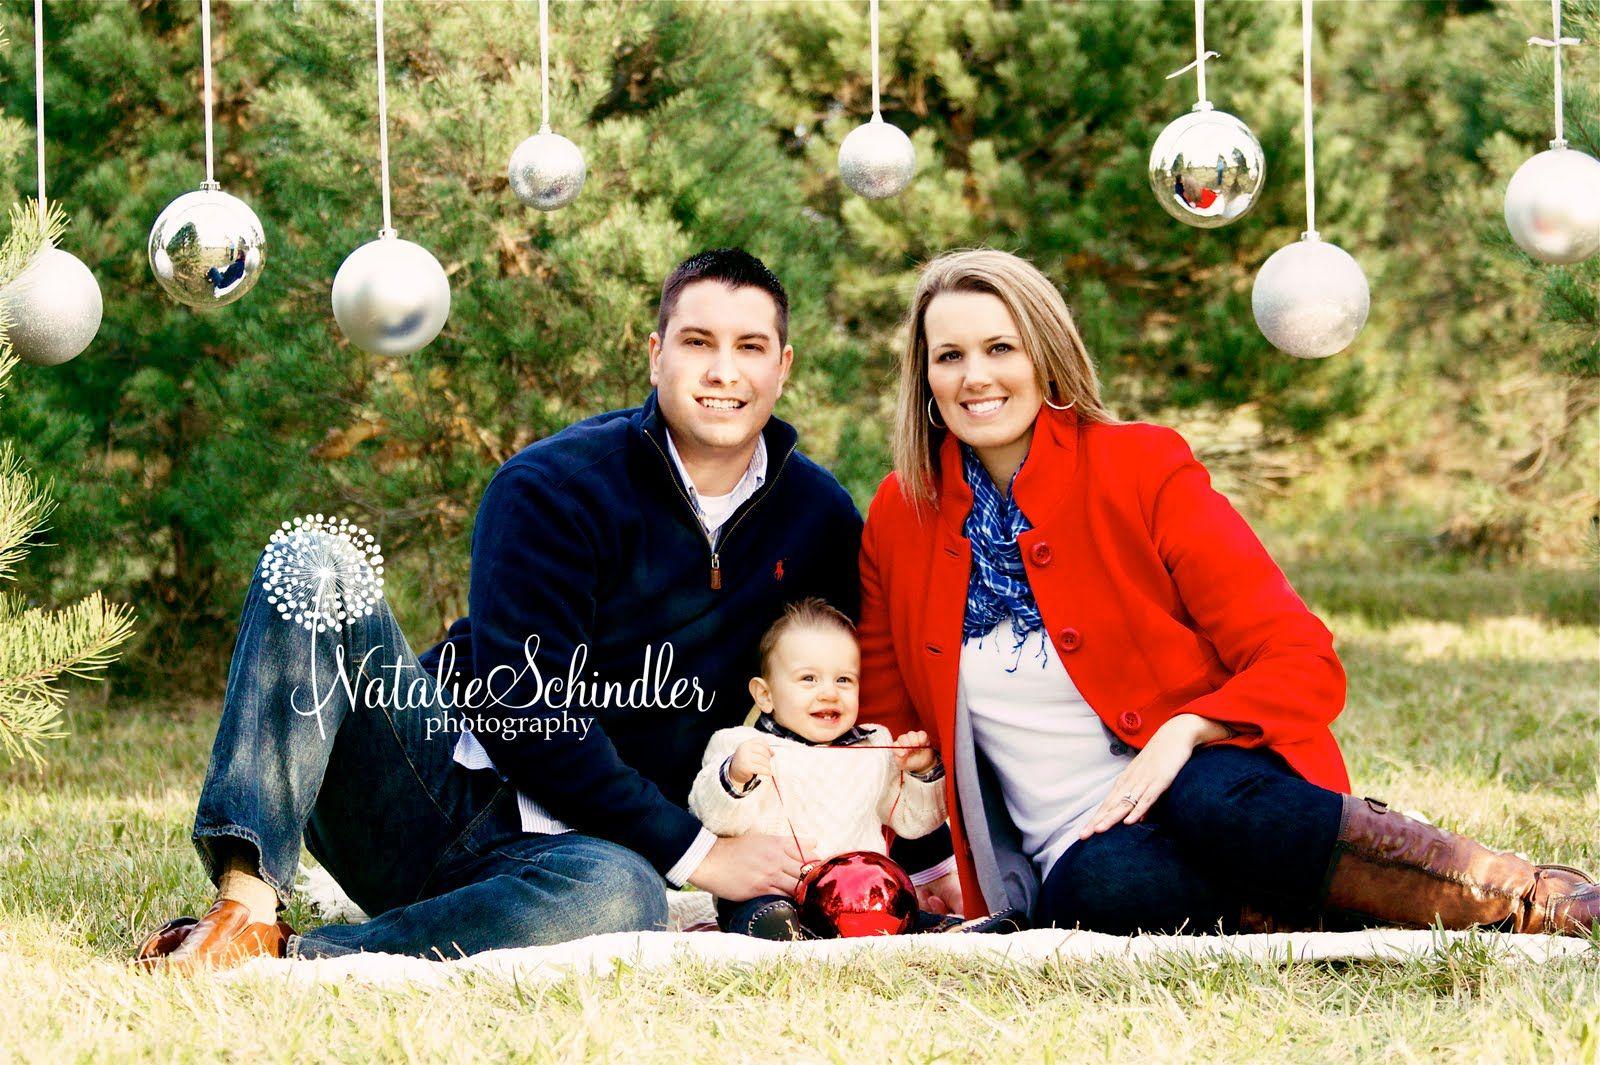 family chrismas session outdoor christmas mini sessions winter photoshoot pinterest. Black Bedroom Furniture Sets. Home Design Ideas